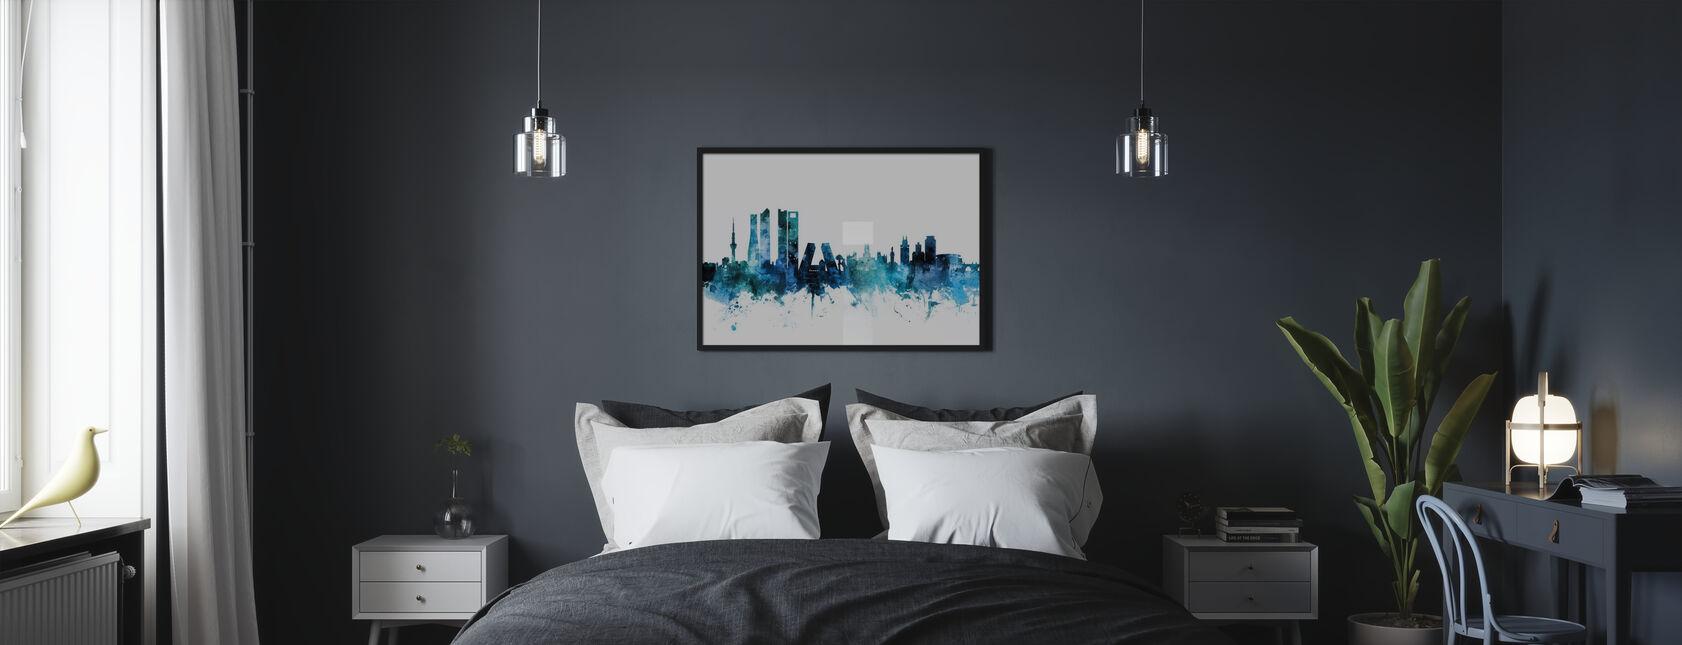 Madrid España Skyline - Póster - Dormitorio